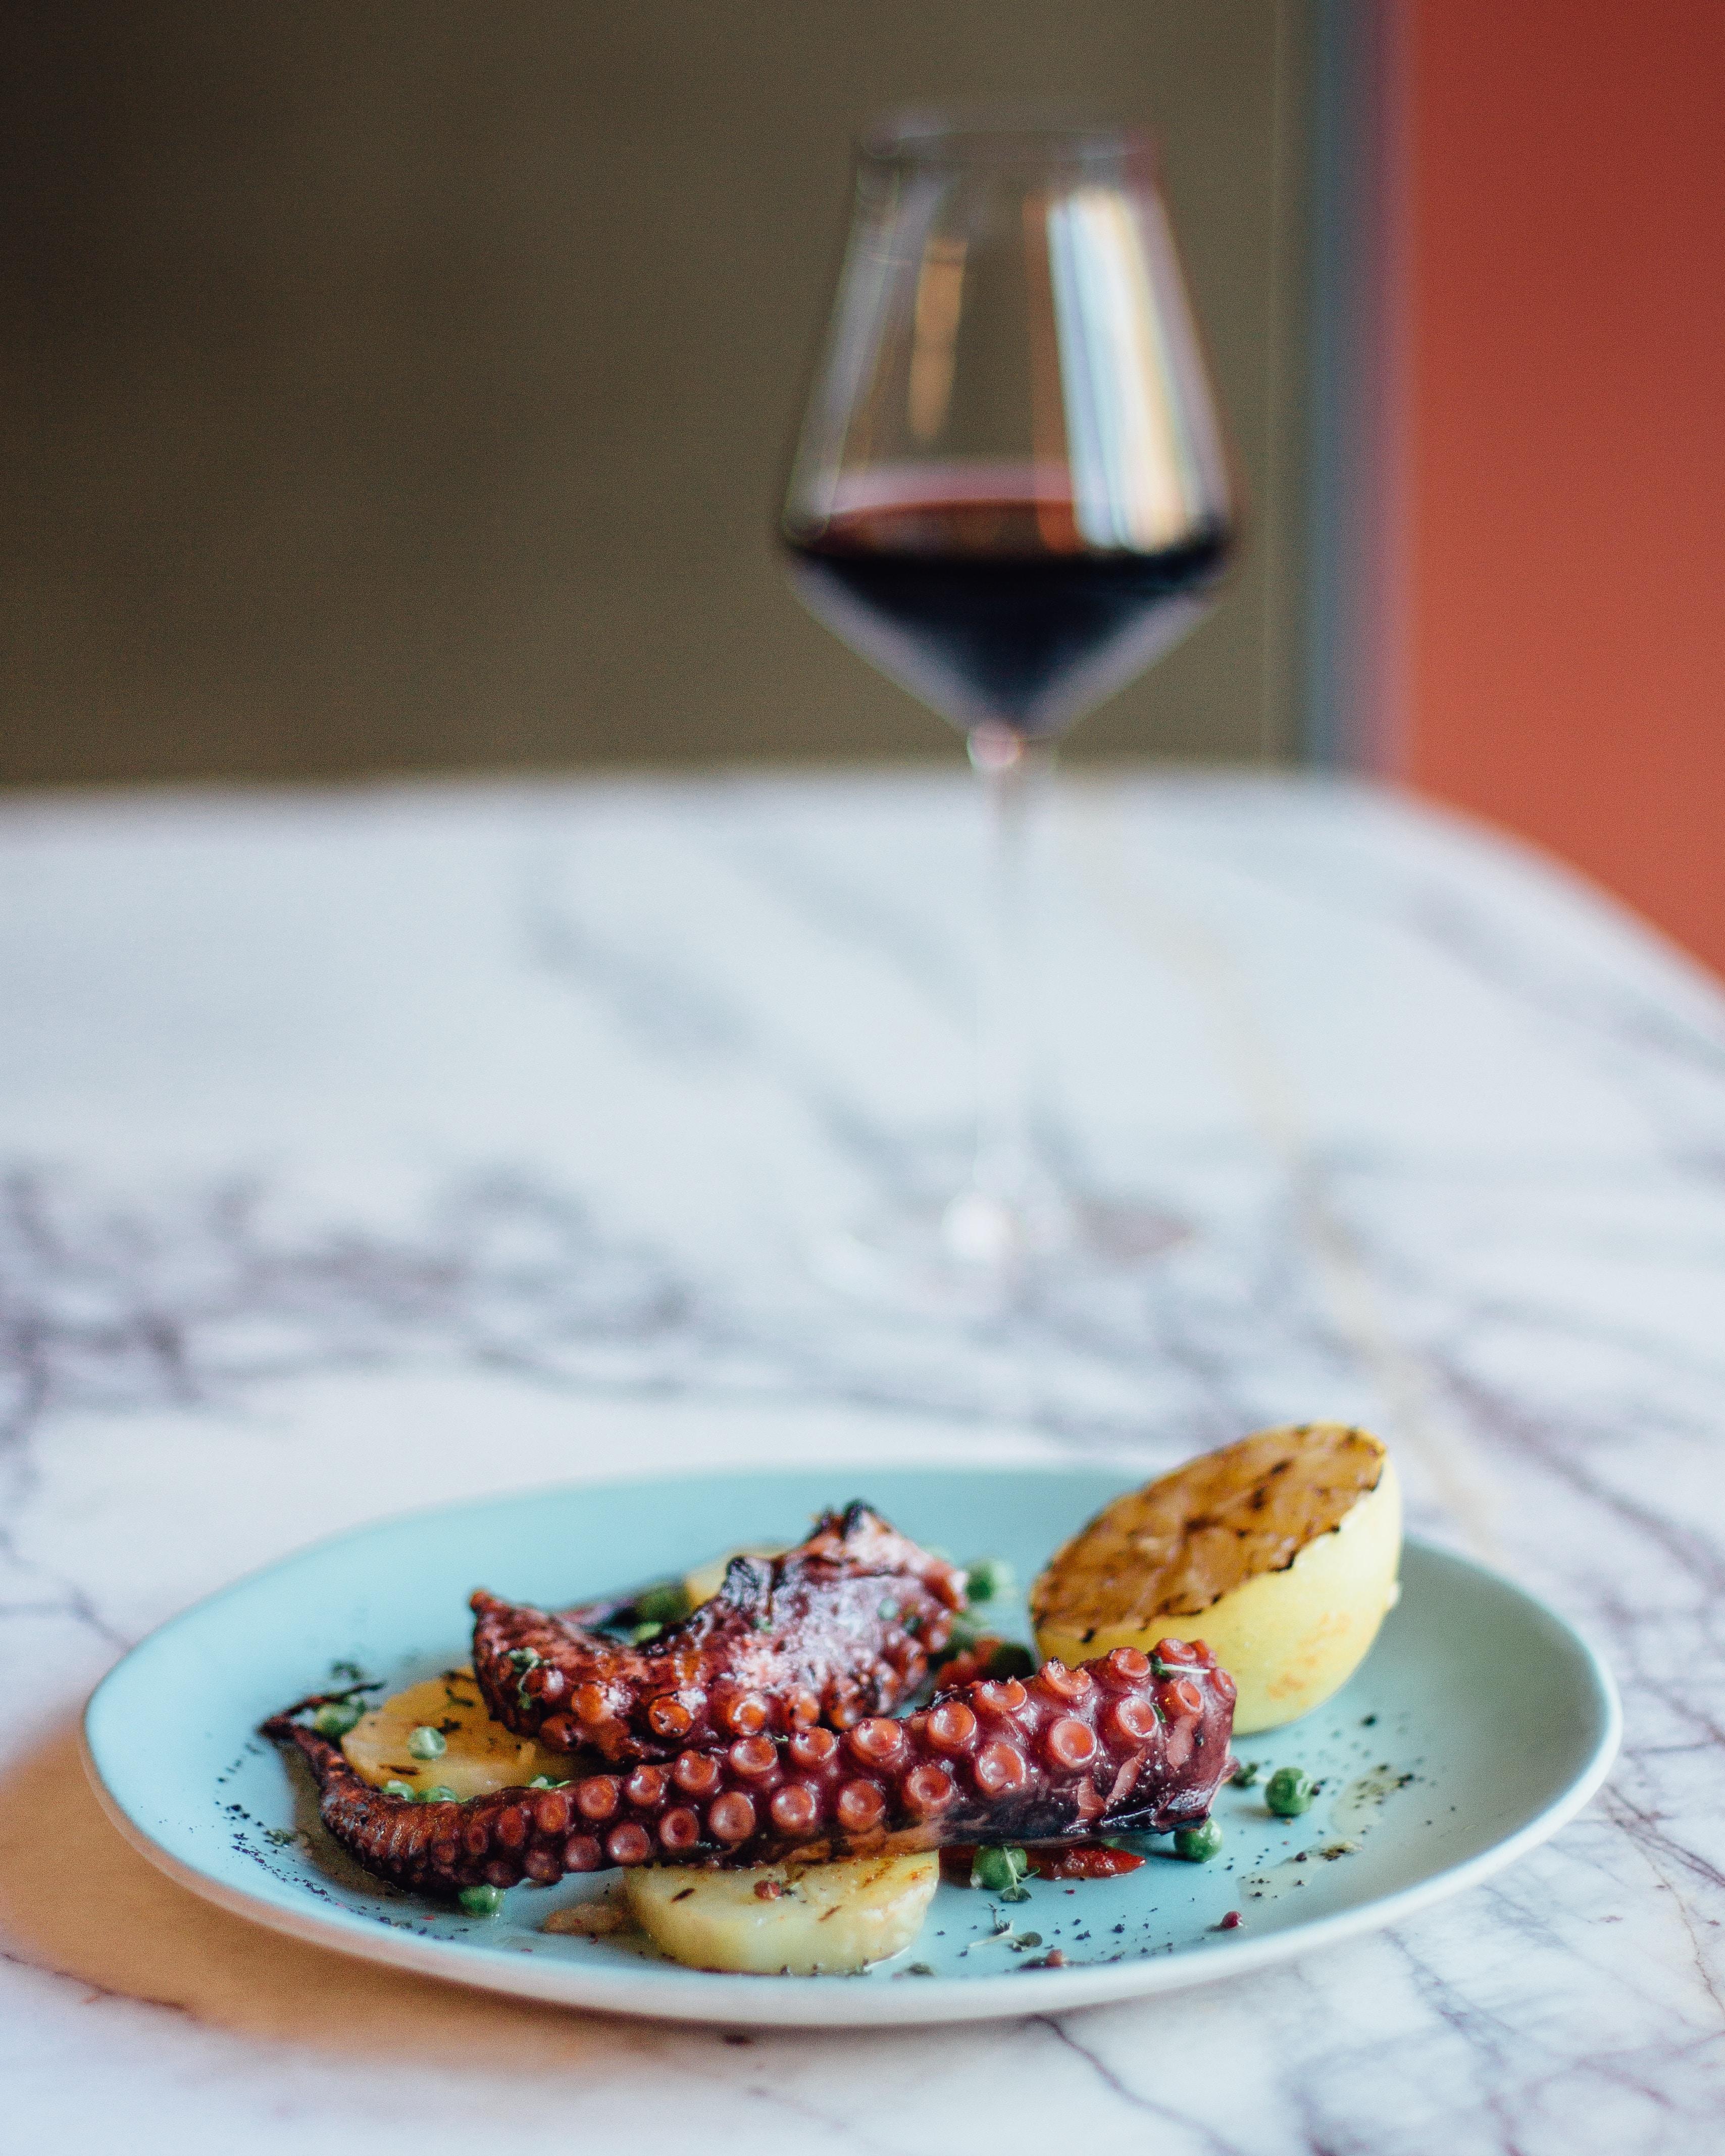 octopus dish with potato